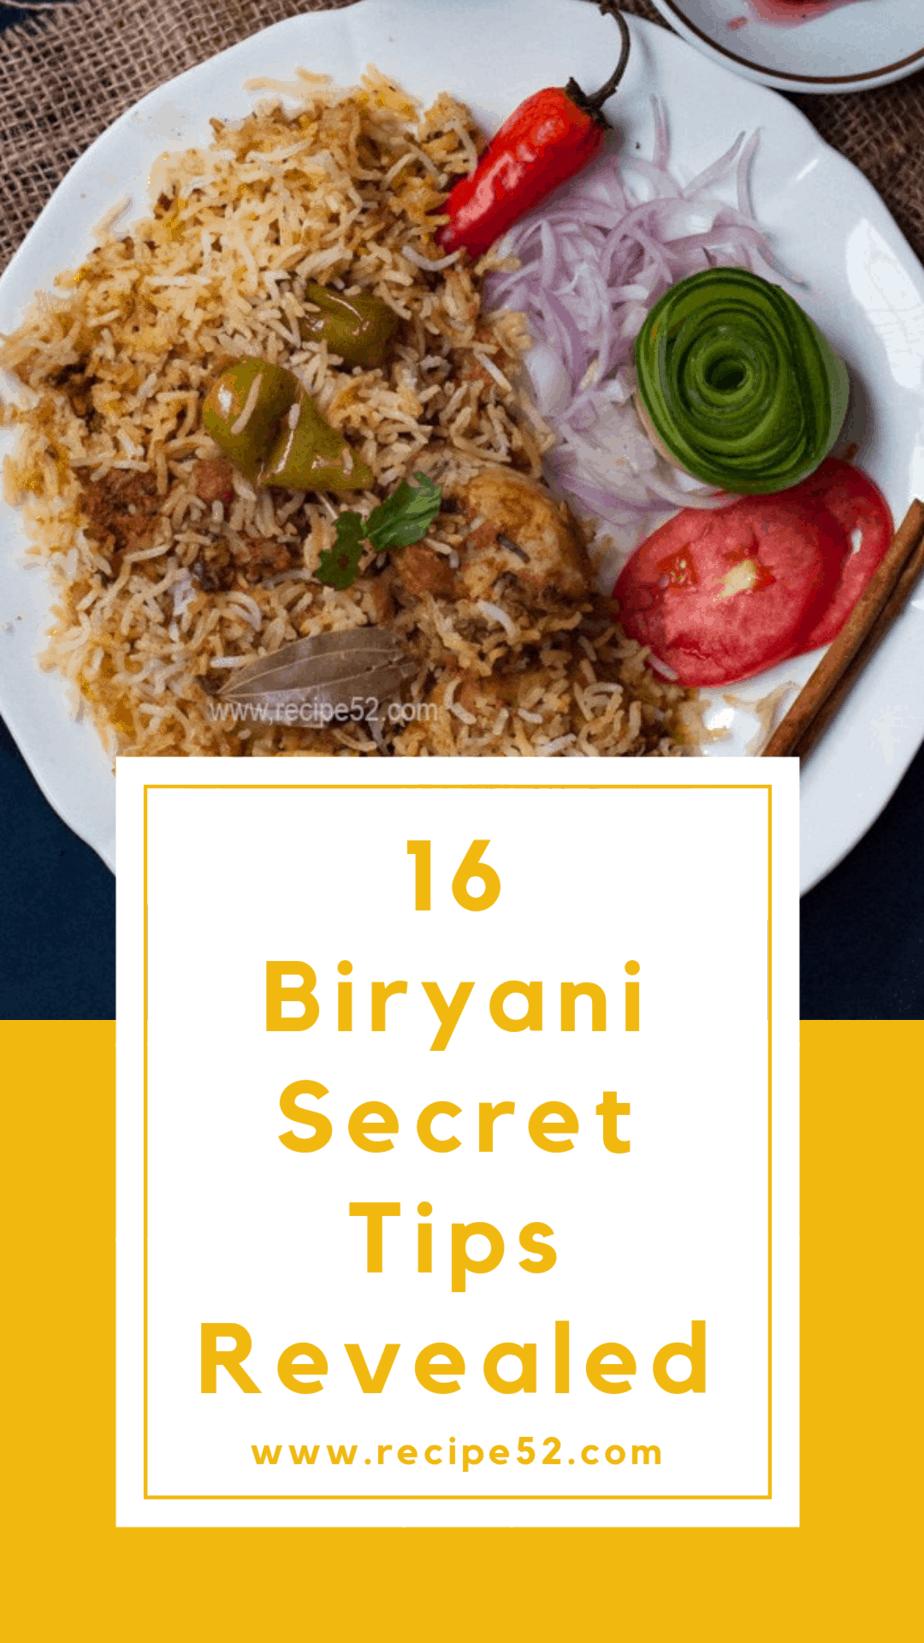 16 Best Biryani Secret Tips Revealed | Recipe52 com